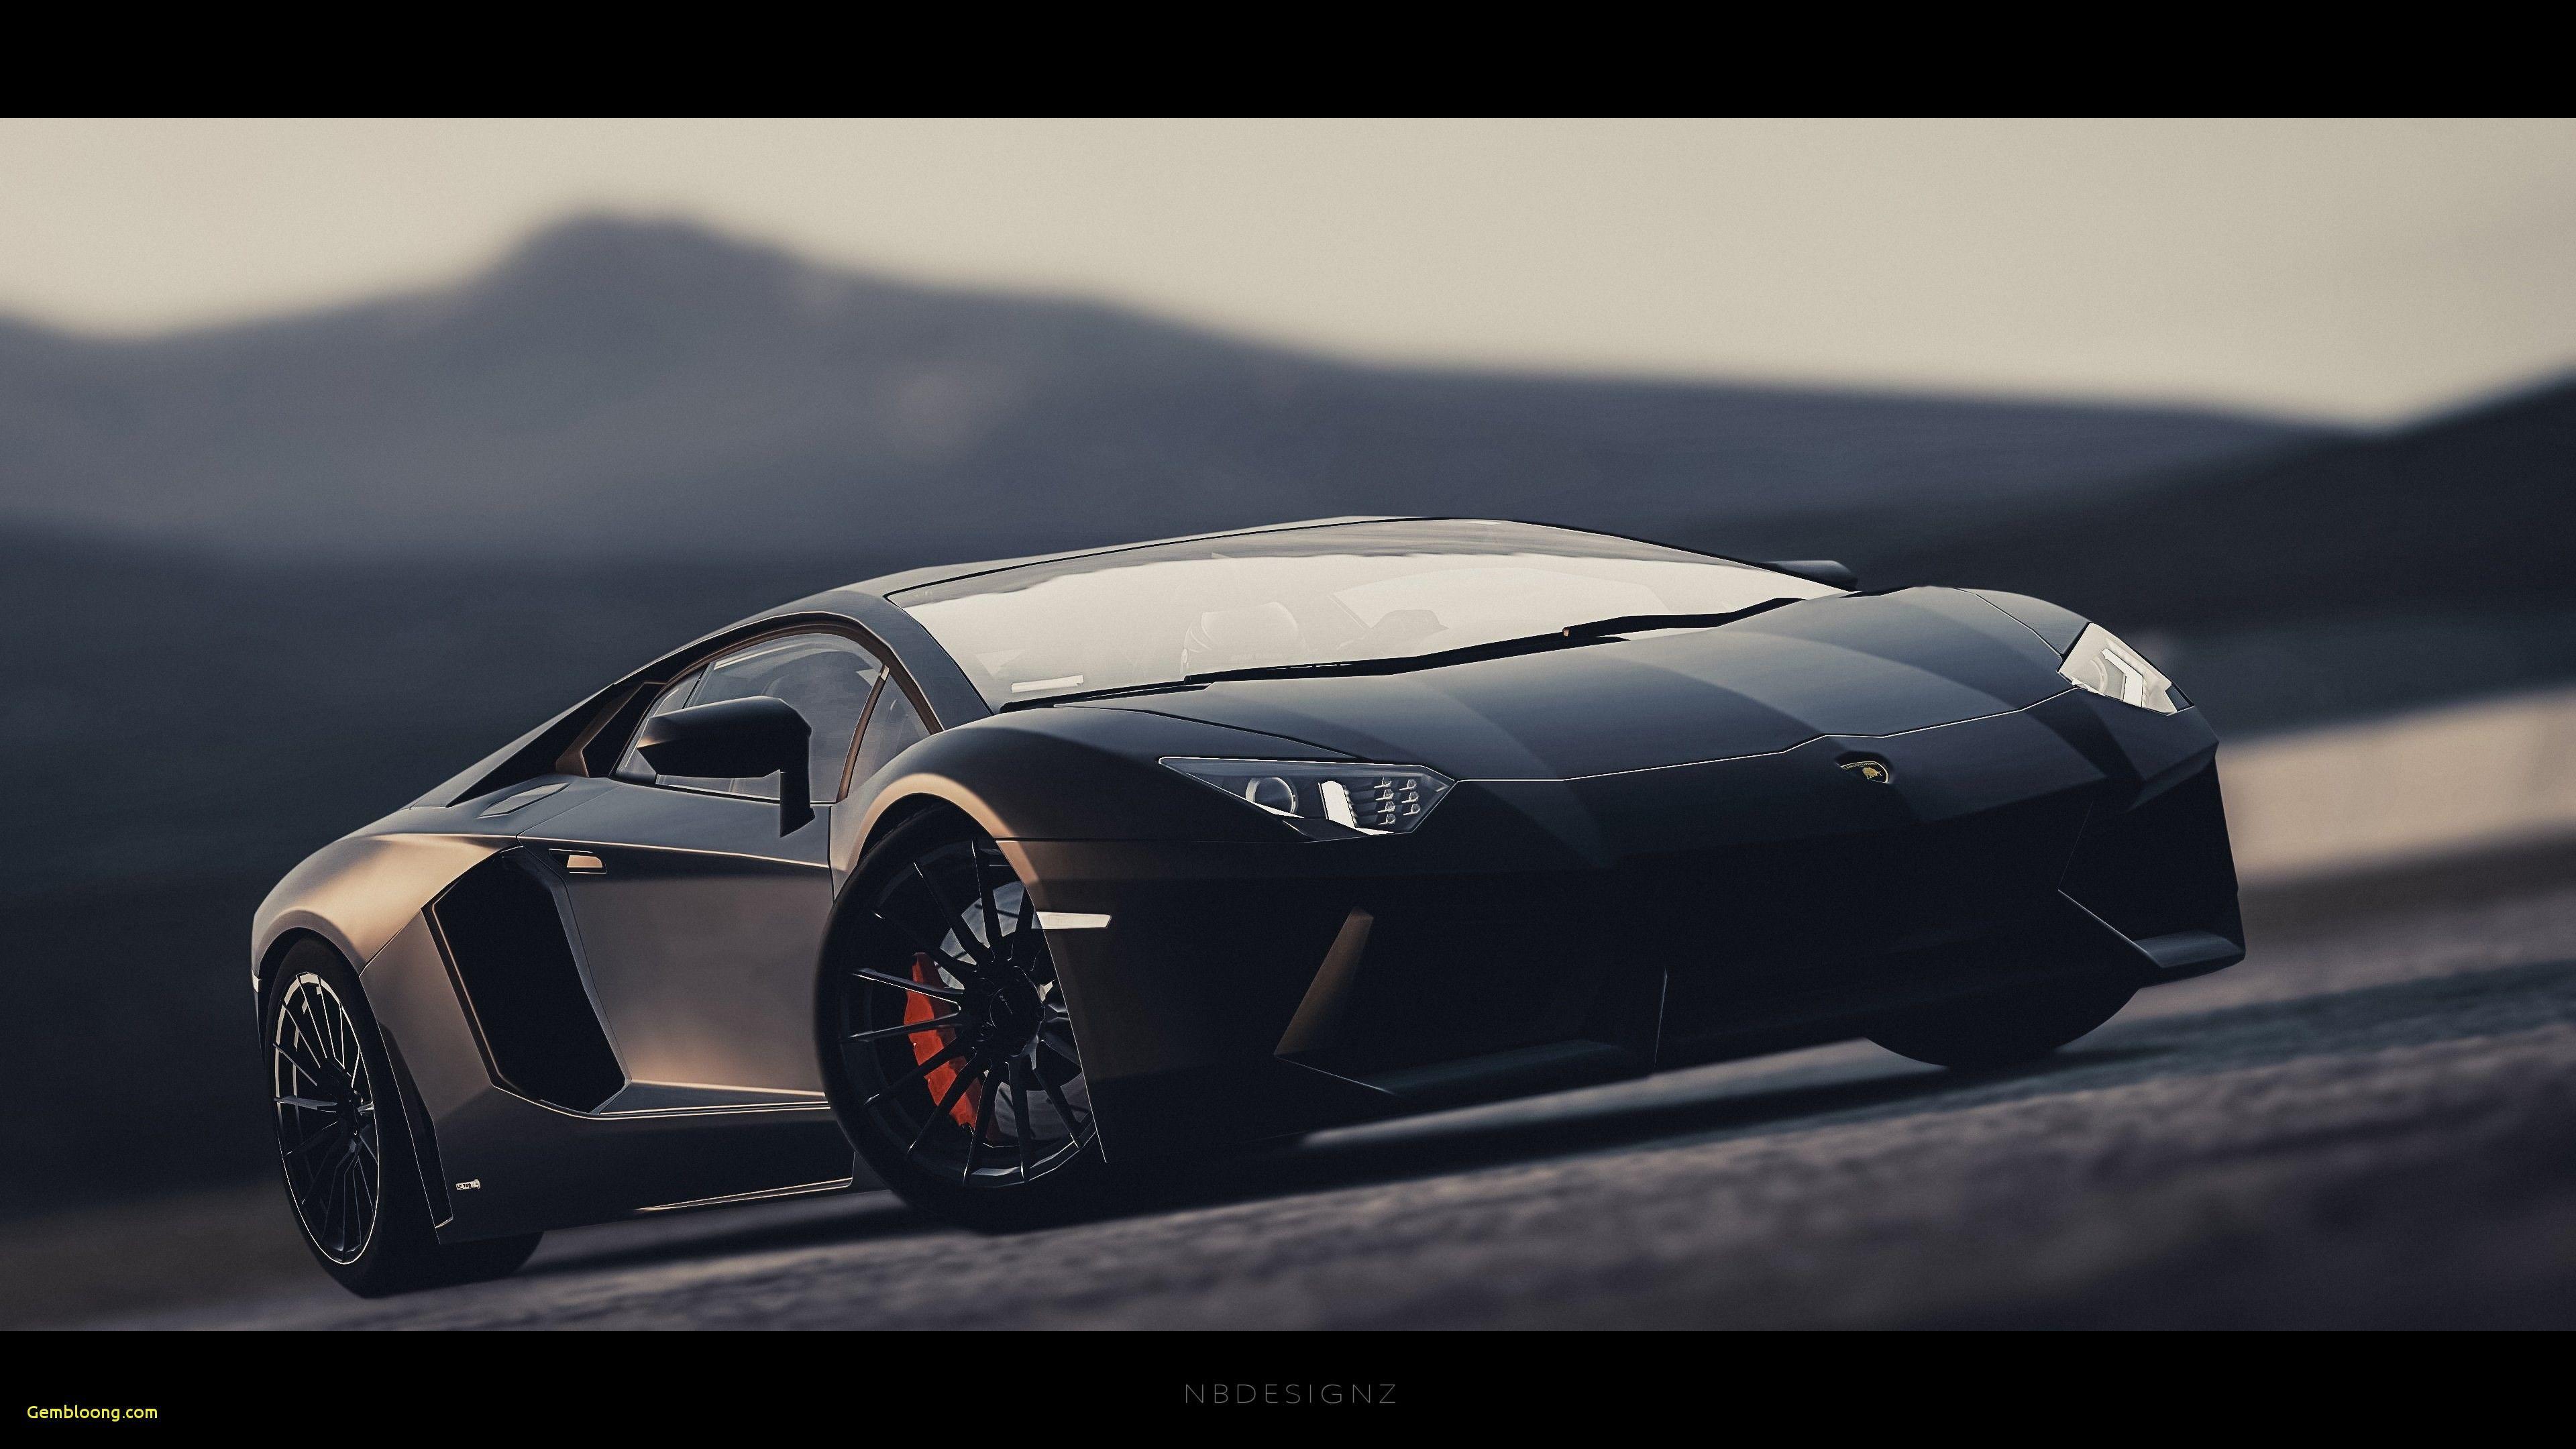 Lambirghini Aventador Wallpapers Desktop Background In 2020 Ultra Hd 4k Wallpaper Lamborghini Aventador Lamborghini